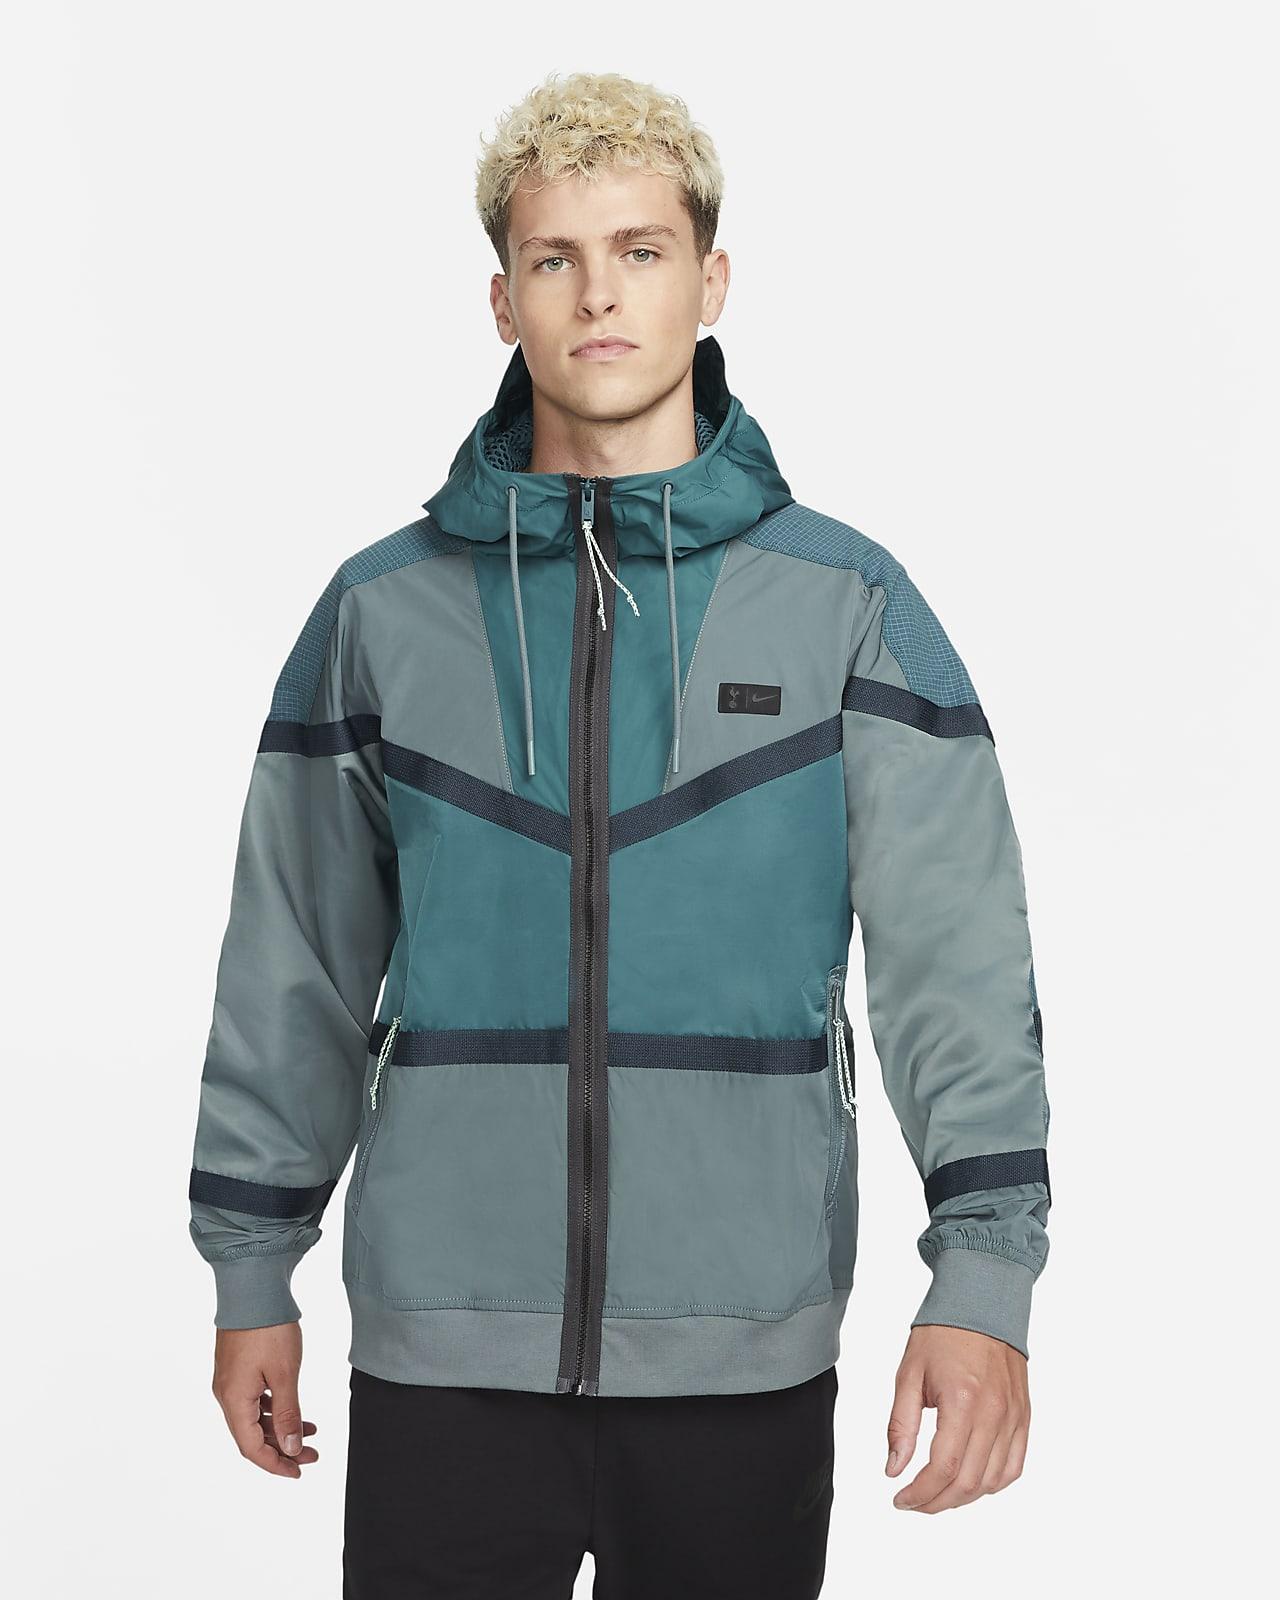 Tottenham Hotspur Men's Hooded Woven Jacket